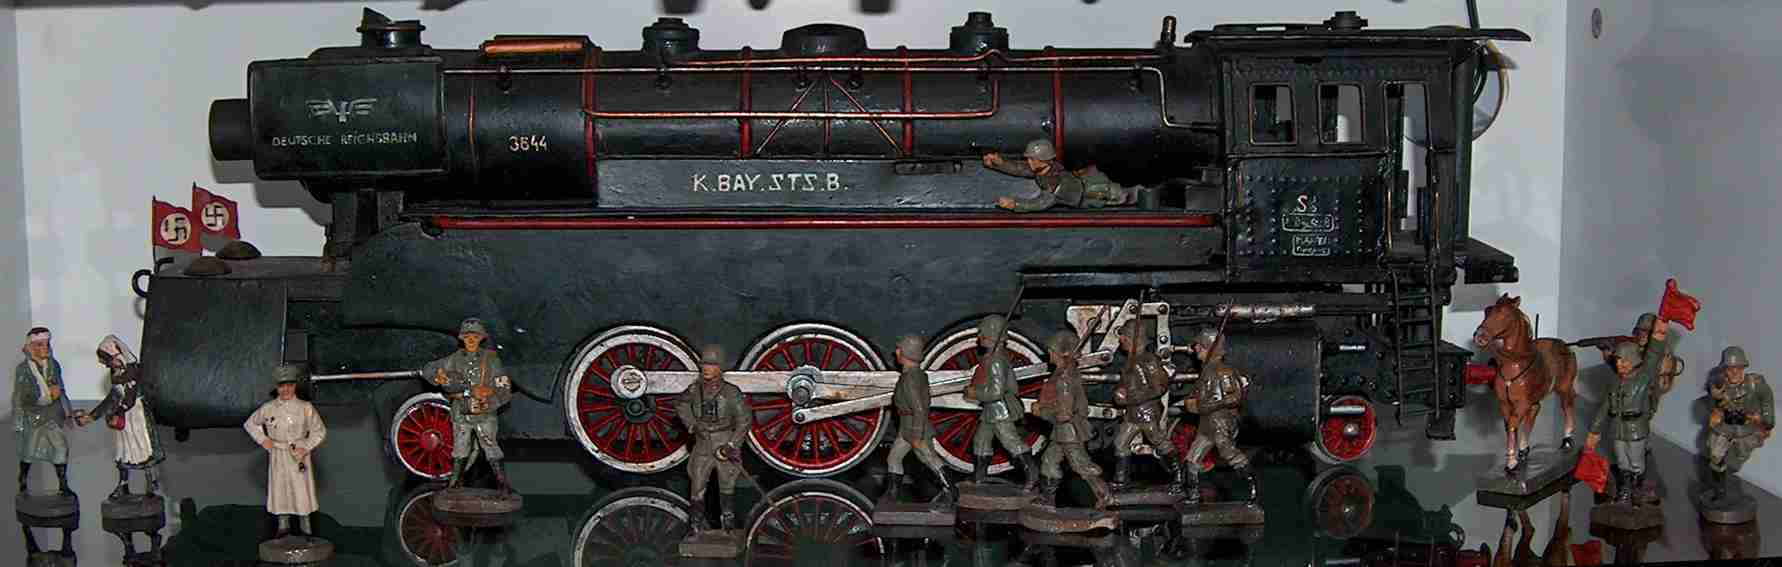 Hausser (Elastolin) Dampflokomotive